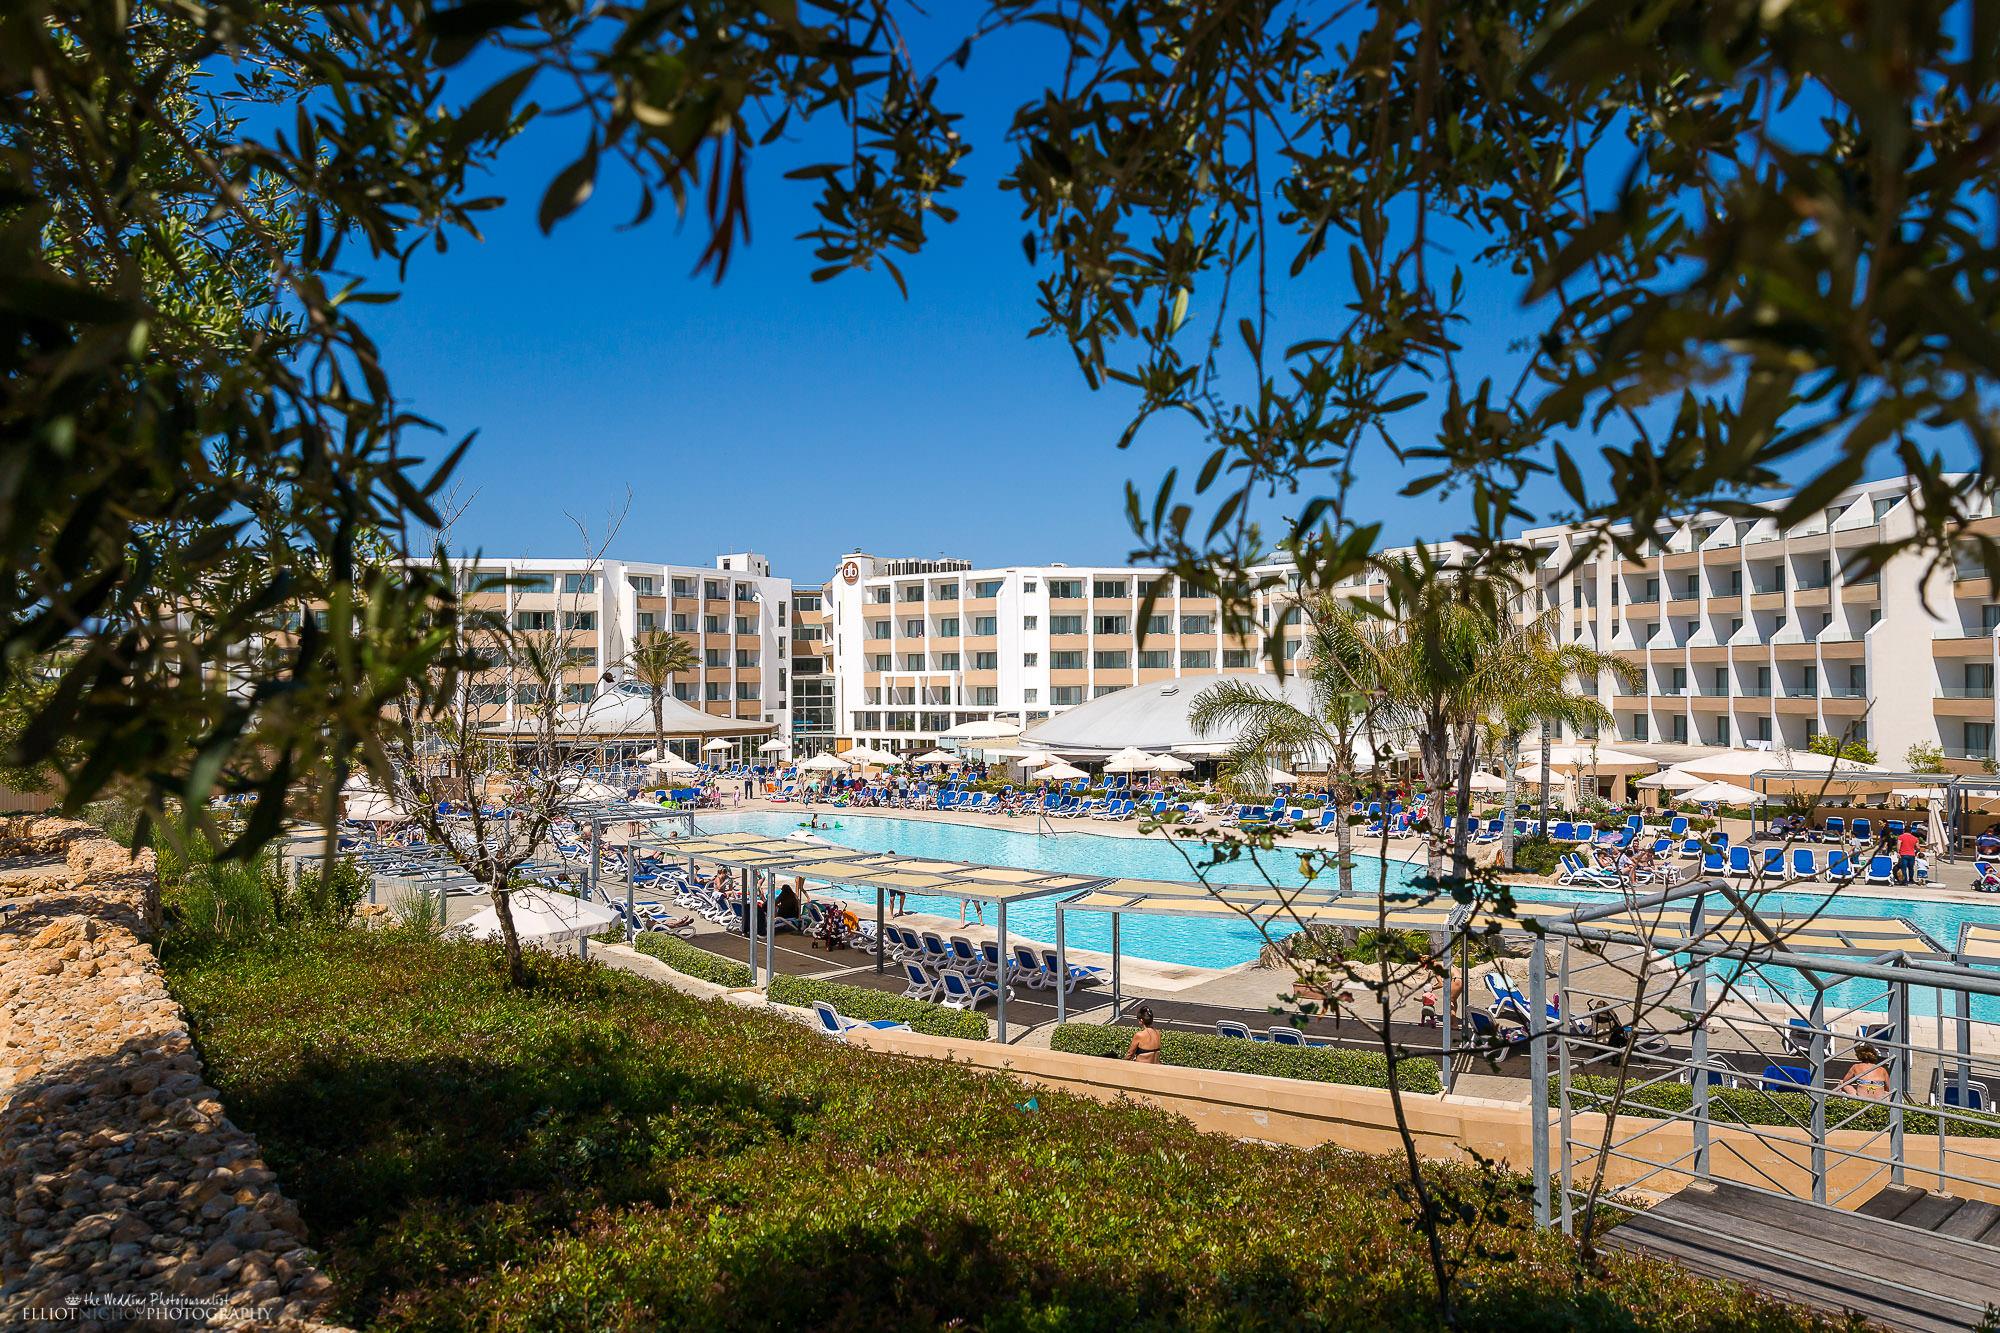 destination-wedding-venue-hotel-Seabank-Mellieha-Malta